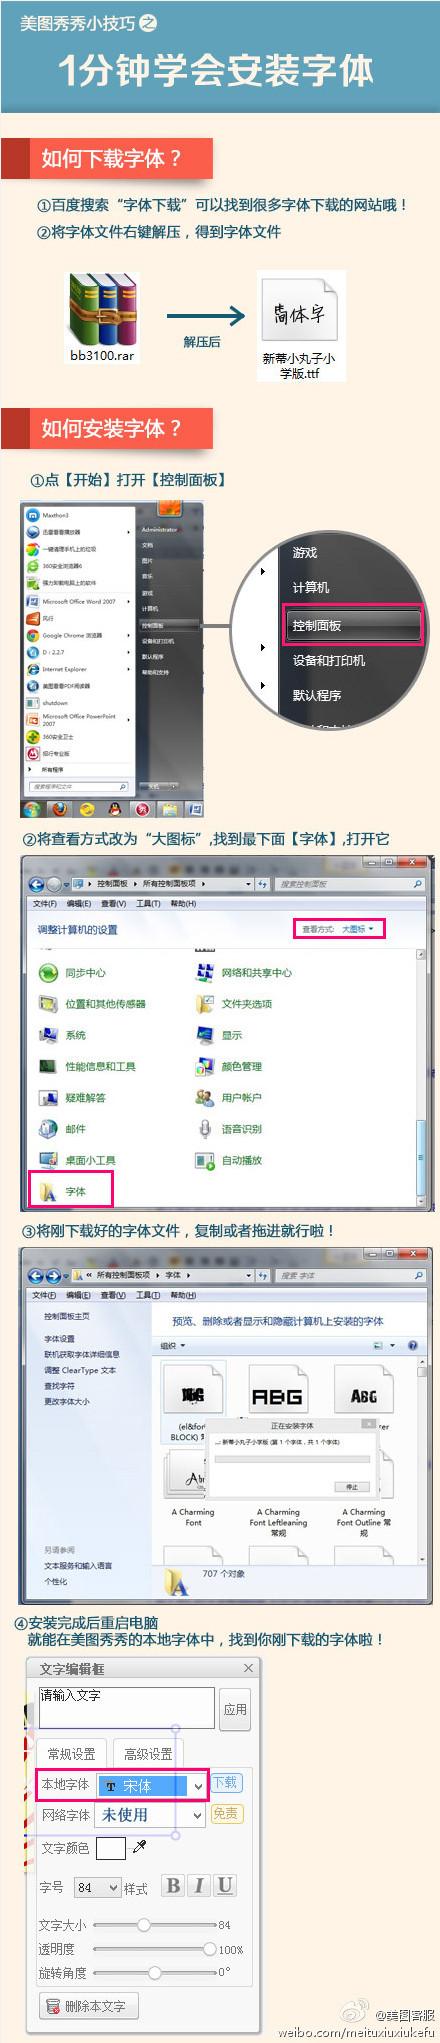 美图秀秀2018v6.0.3.2 官方最新版_wishdown.com